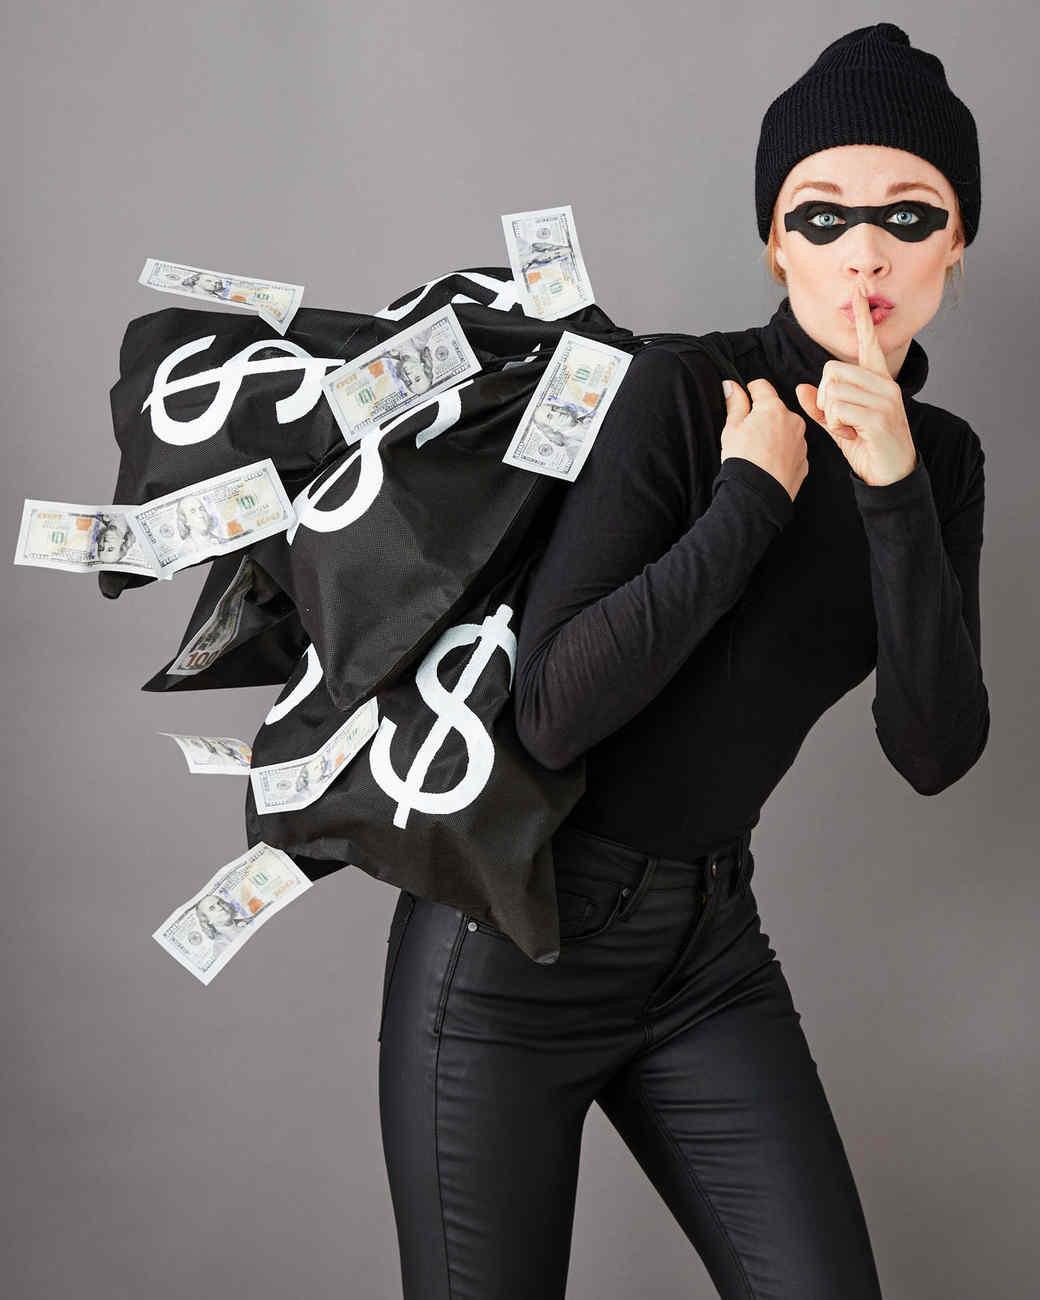 Burglar Costume DIY  Bank Robber Costume